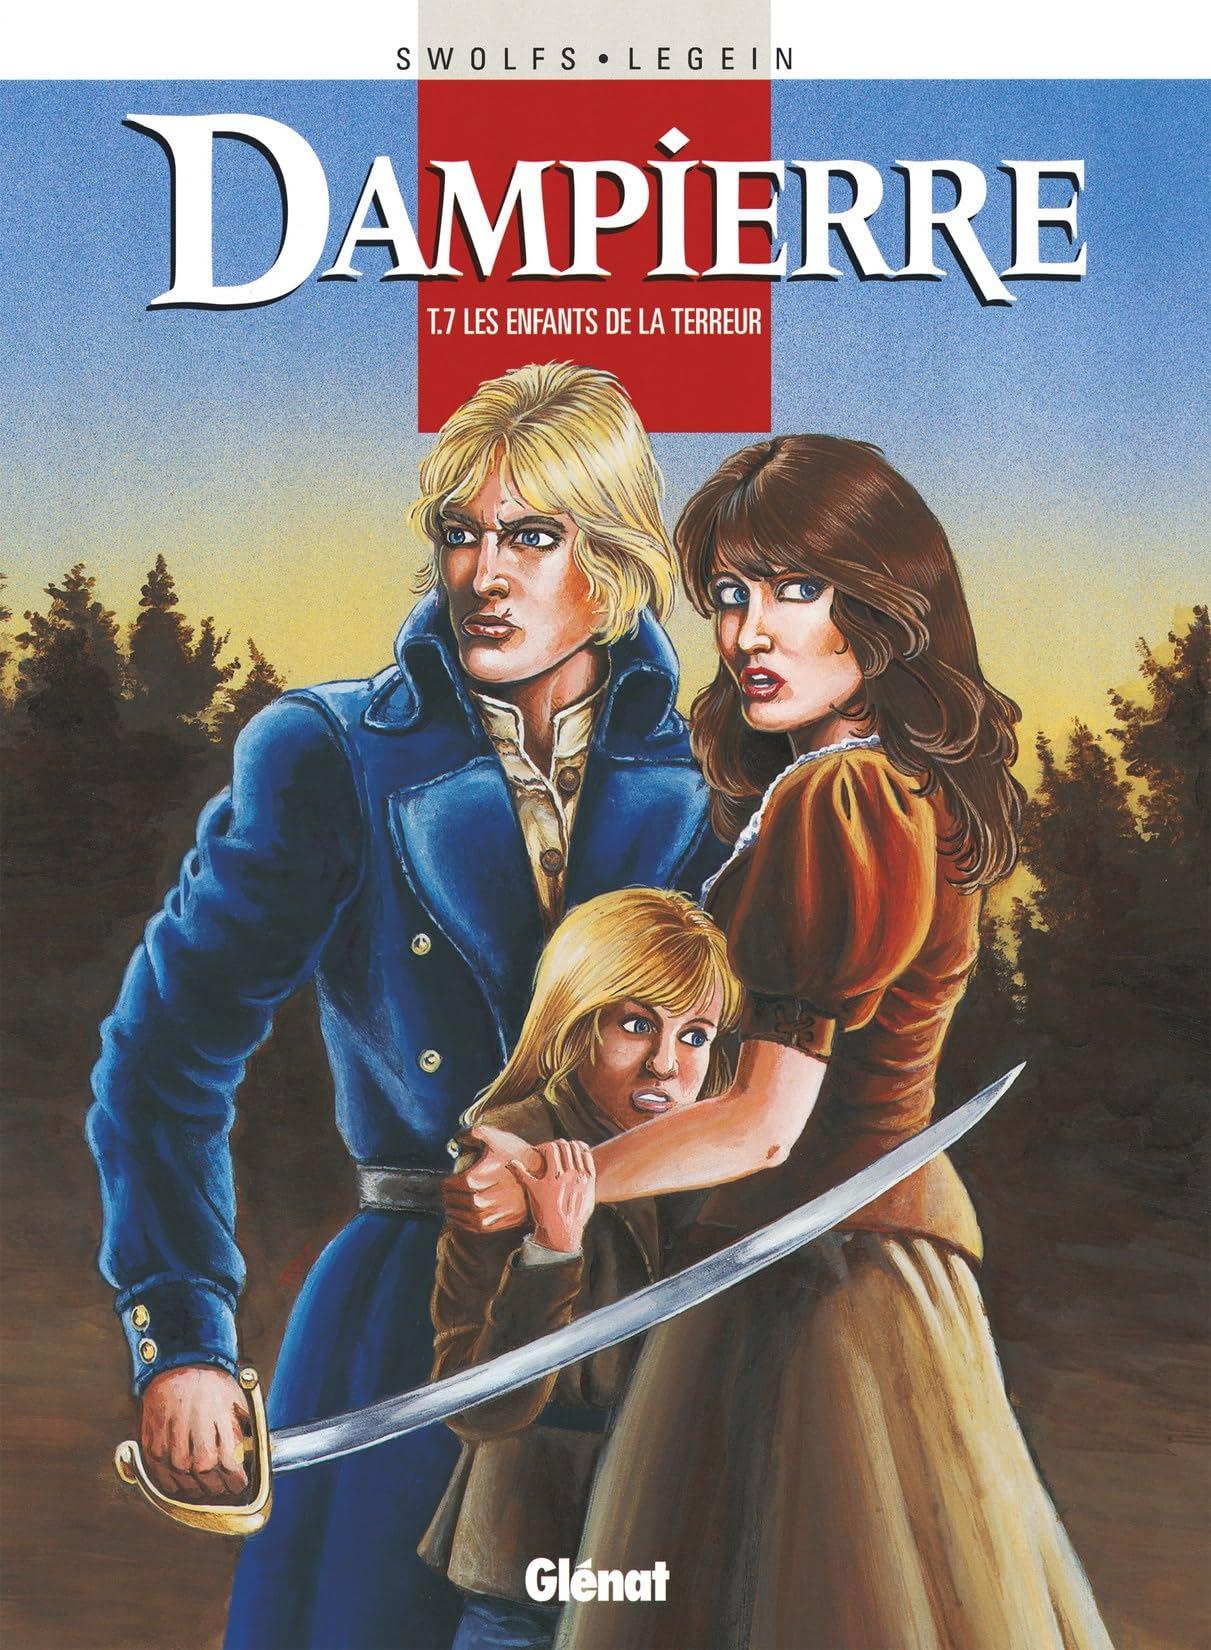 Dampierre Vol. 7: Les Enfants de la Terreur